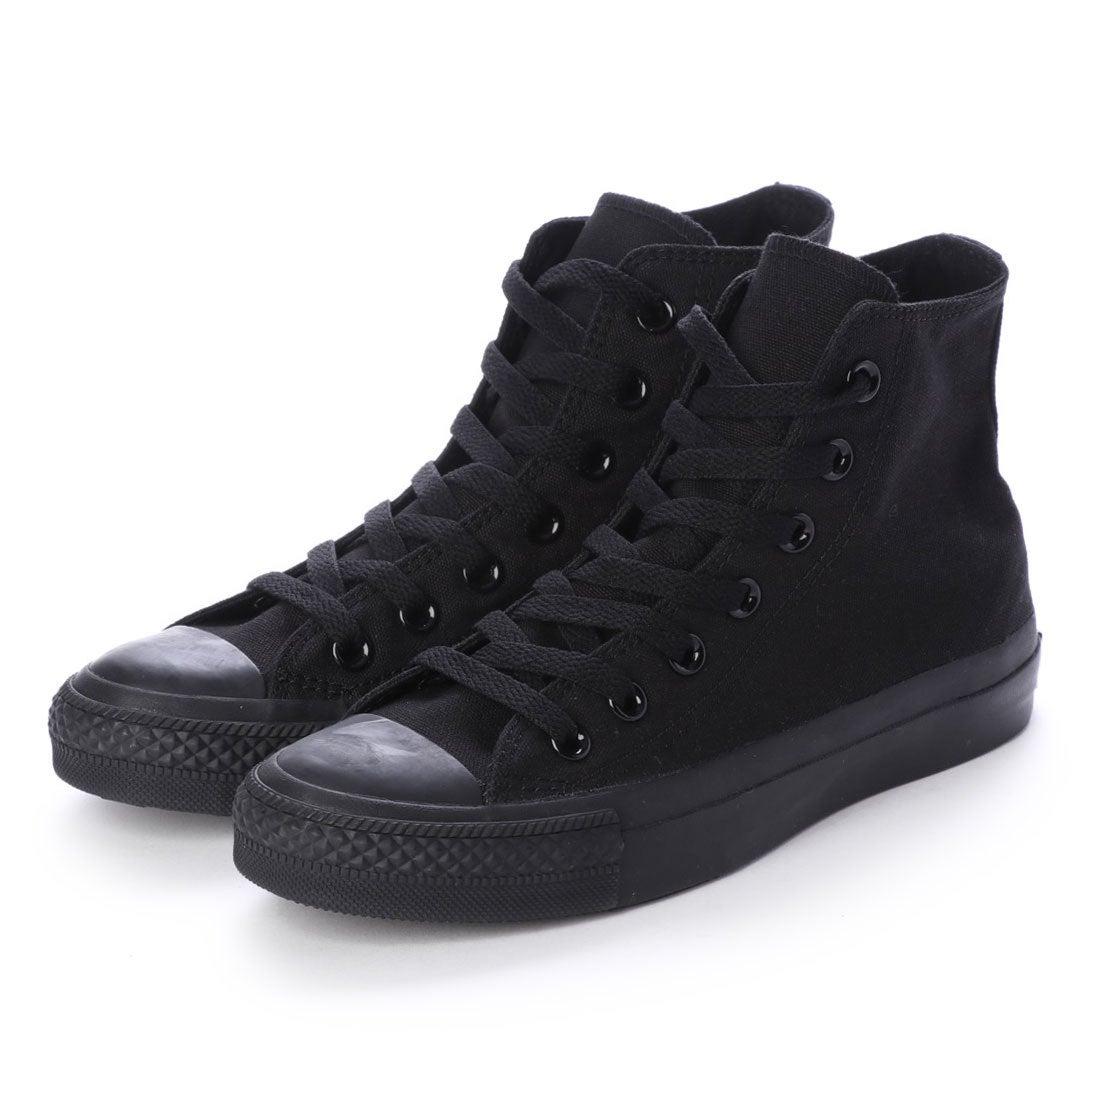 73a1a47e44ca コンバース キャンバスオールスターHI / CONVERSE M3310CVS AS HI (ブラックモノクローム) -靴&ファッション通販  ロコンド〜自宅で試着、気軽に返品